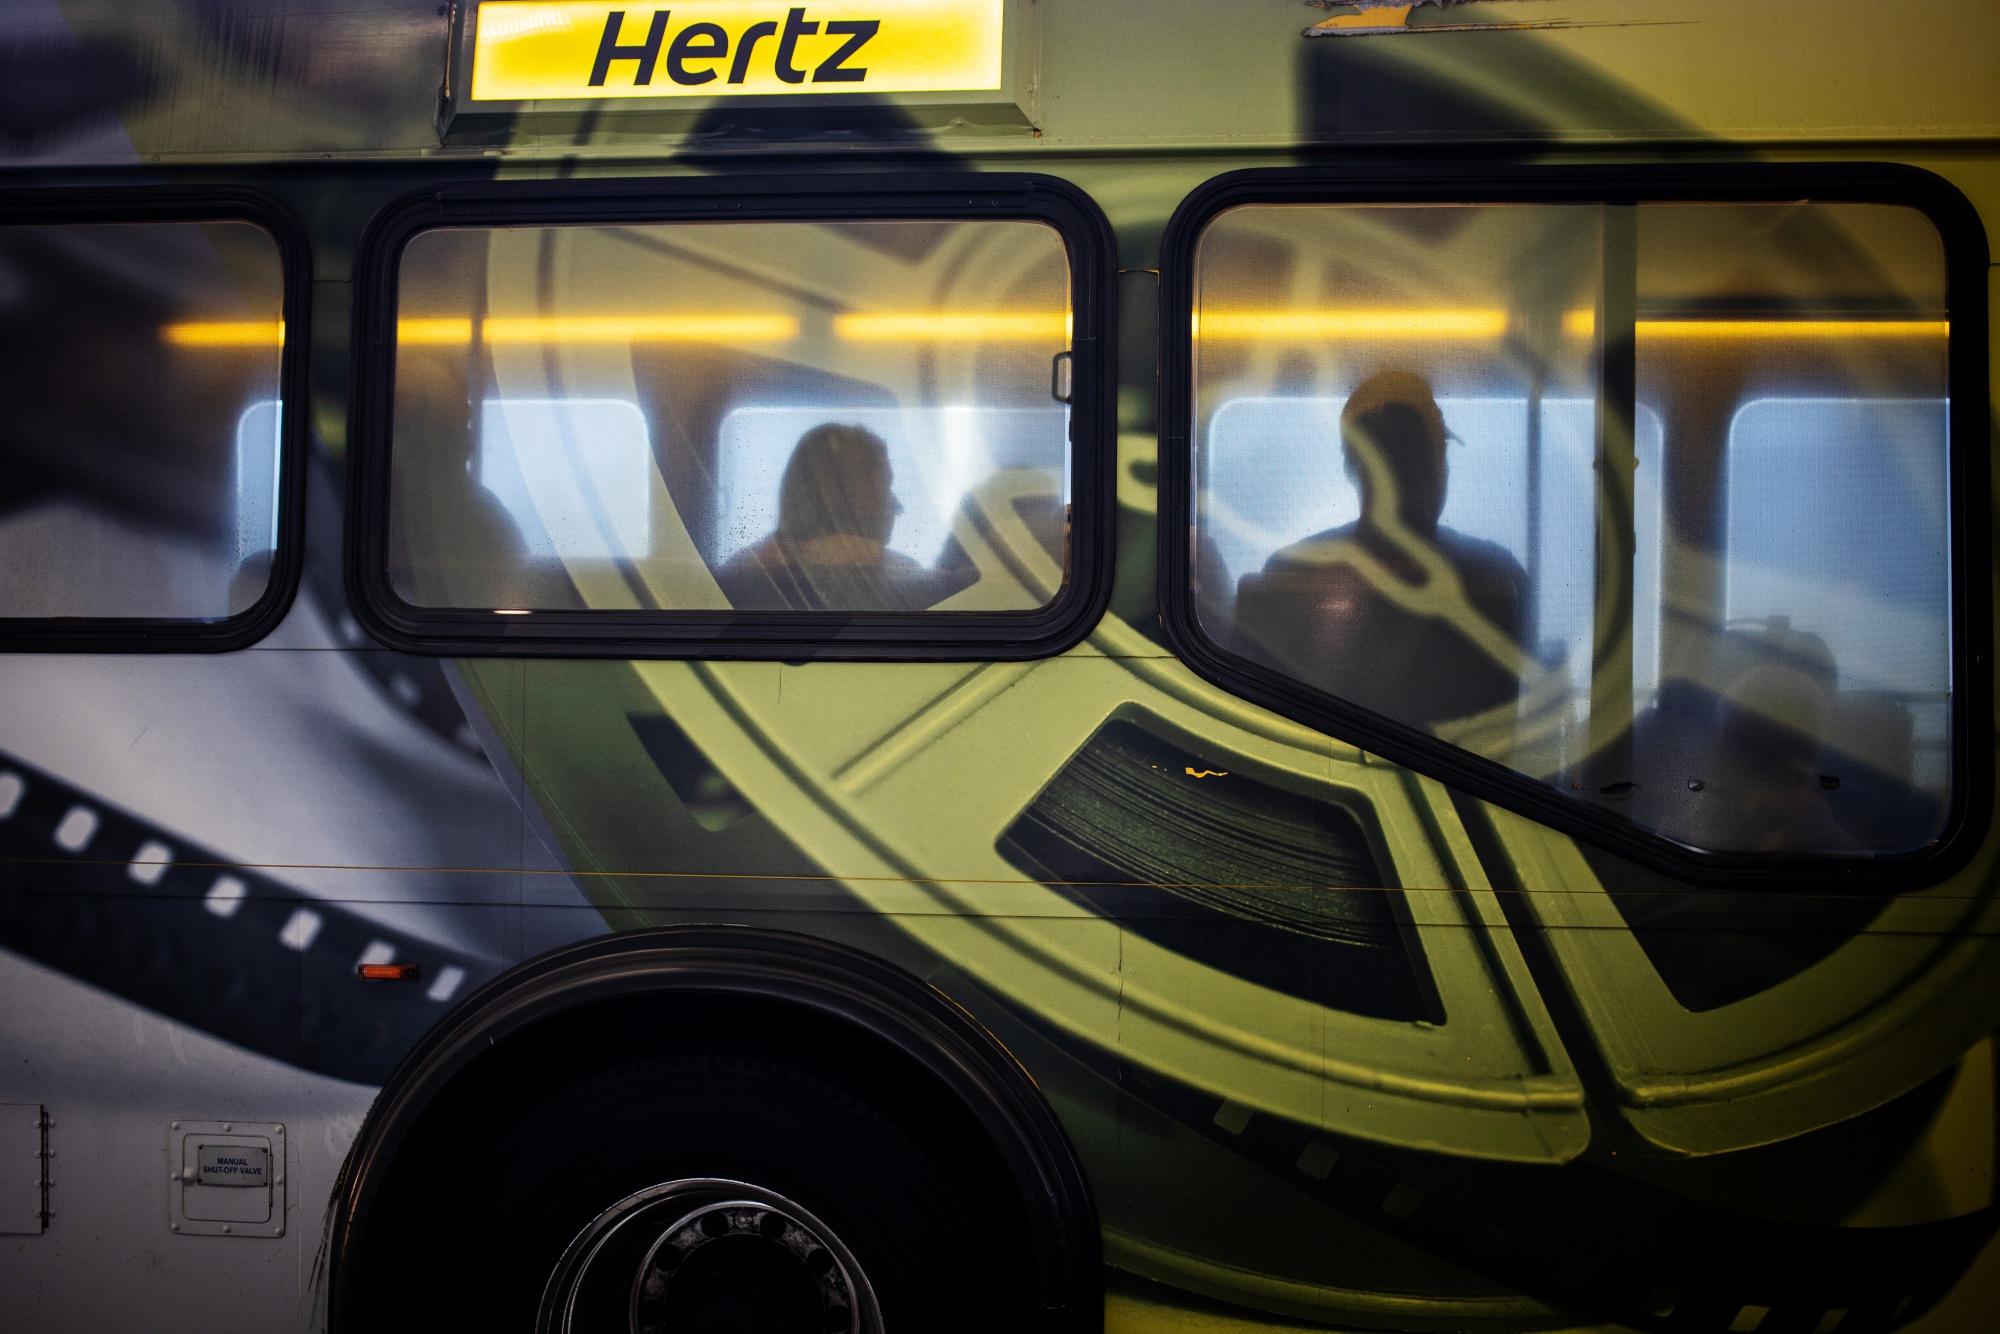 Hertz Creditors In 11 Billion Standoff Over 494 000 Used Cars Bloomberg